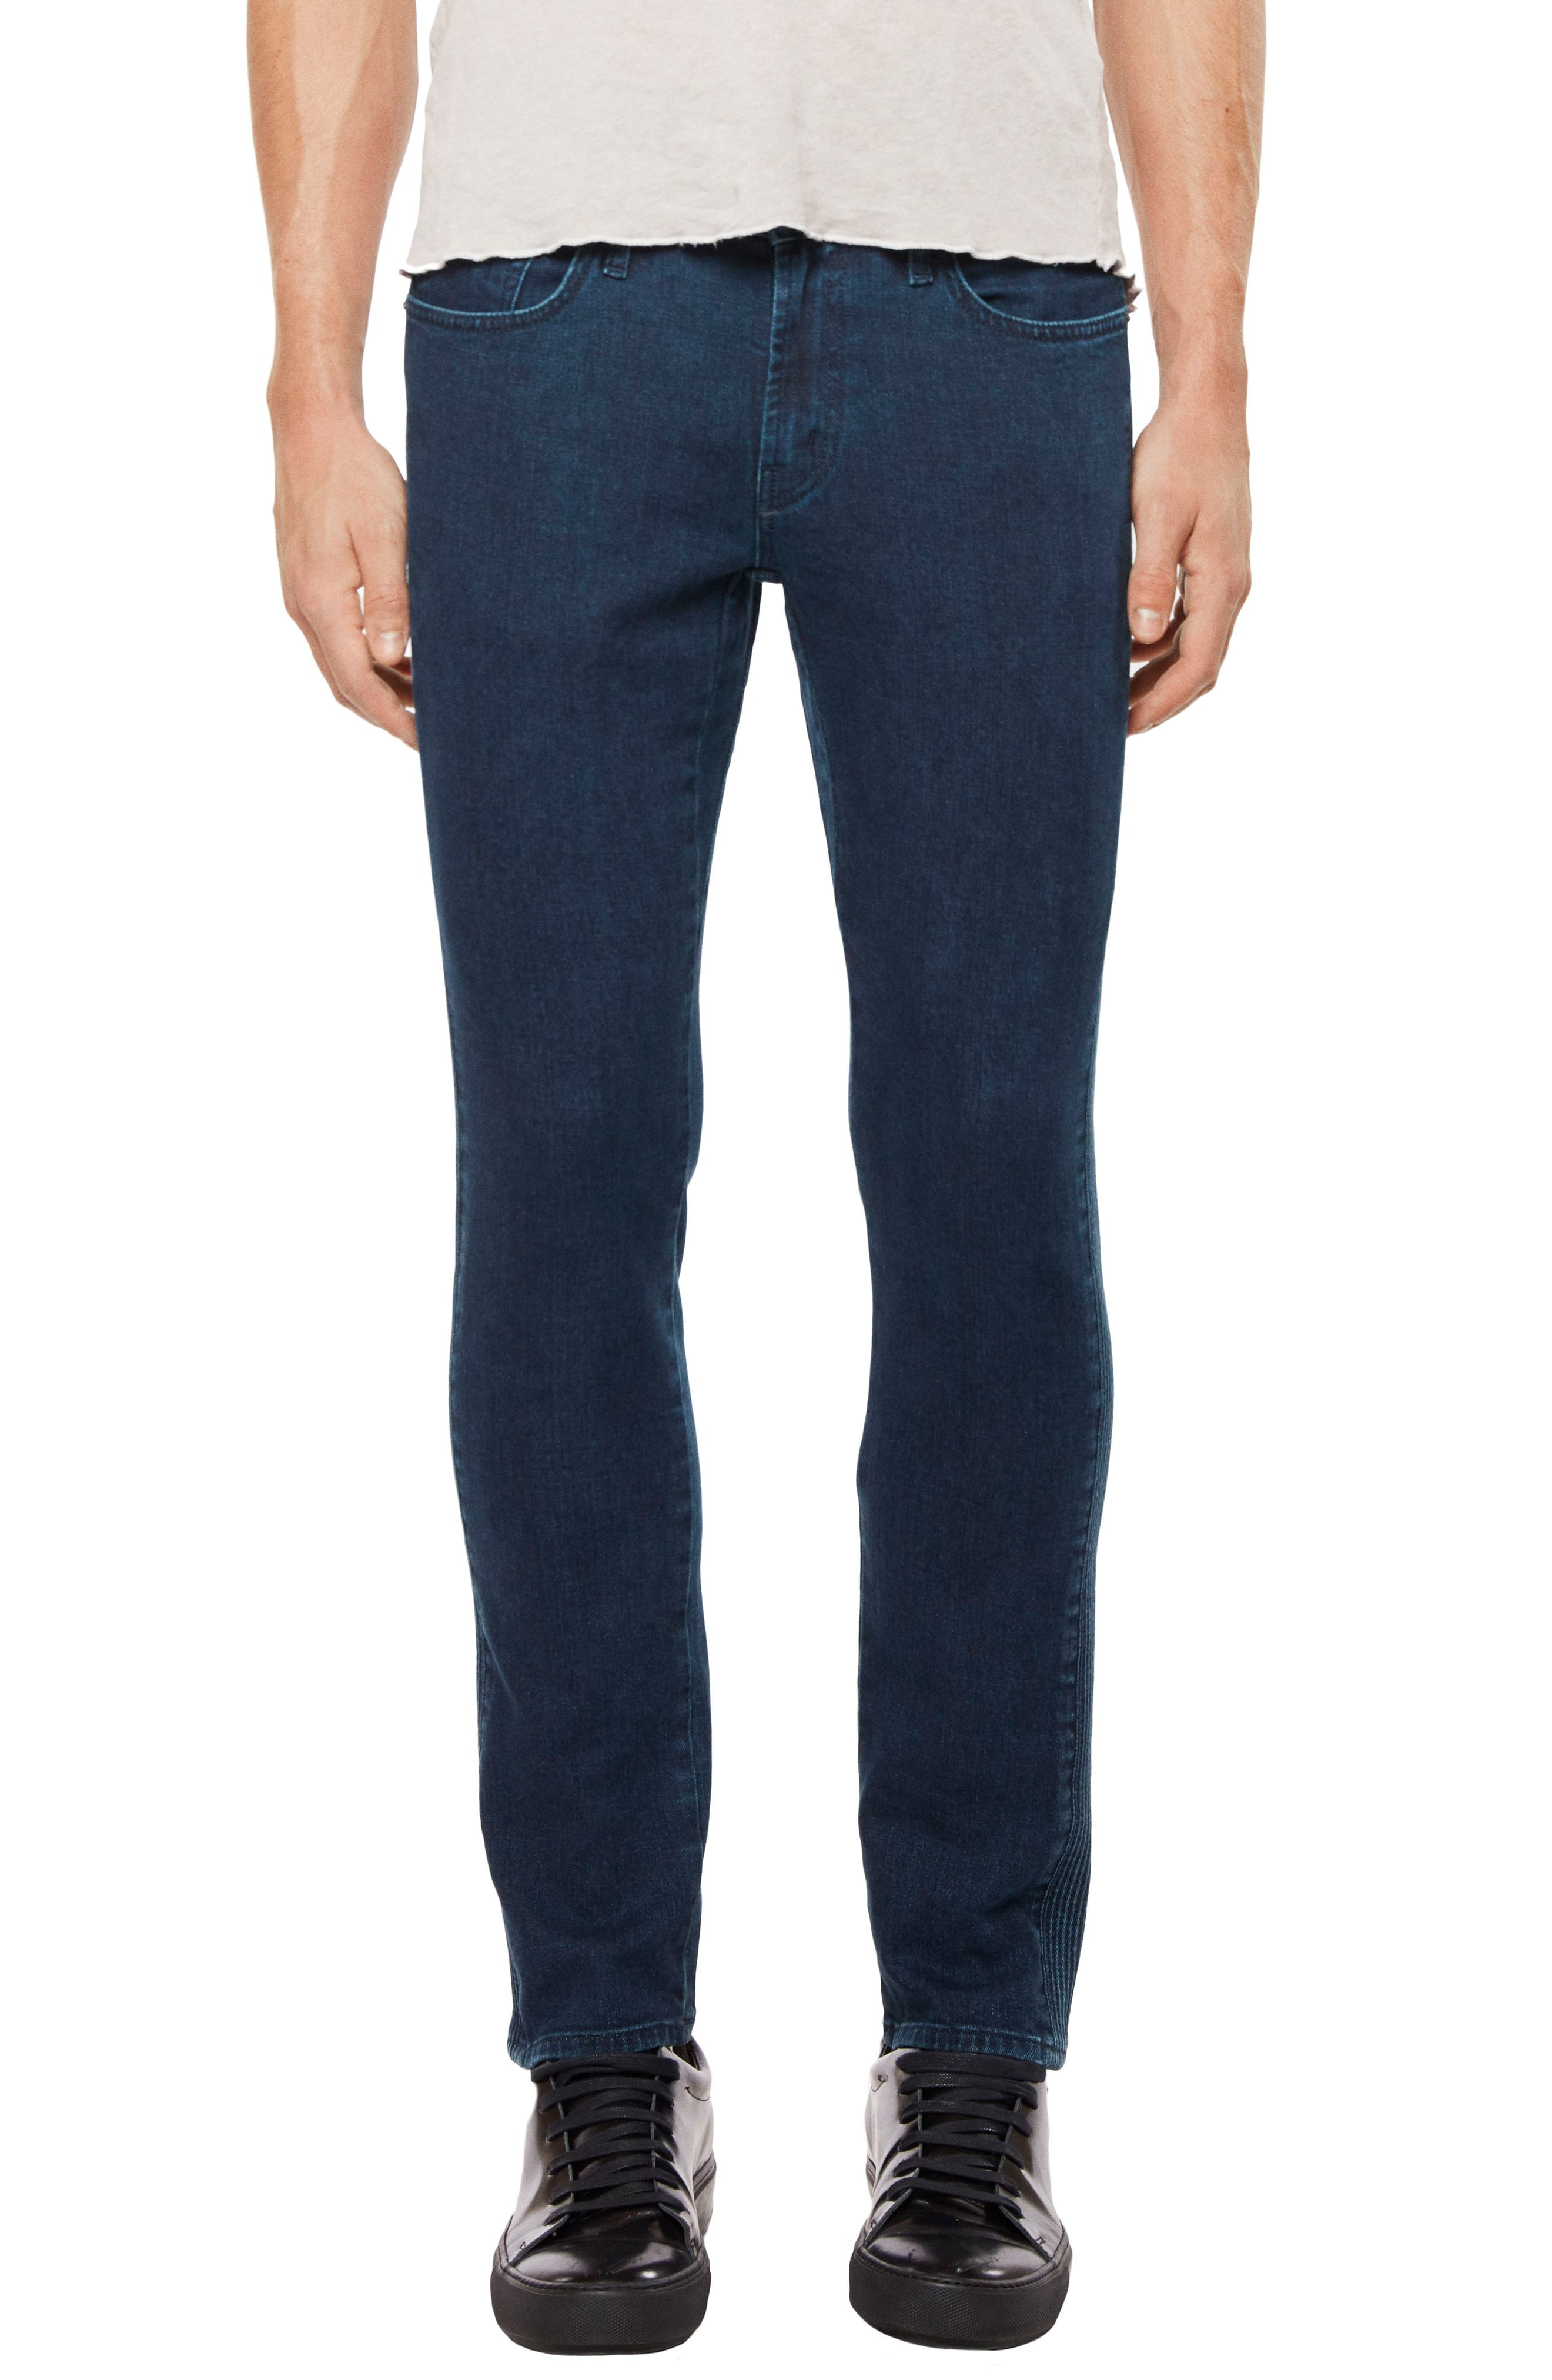 Moto Skinny Fit Jeans,                             Main thumbnail 1, color,                             403